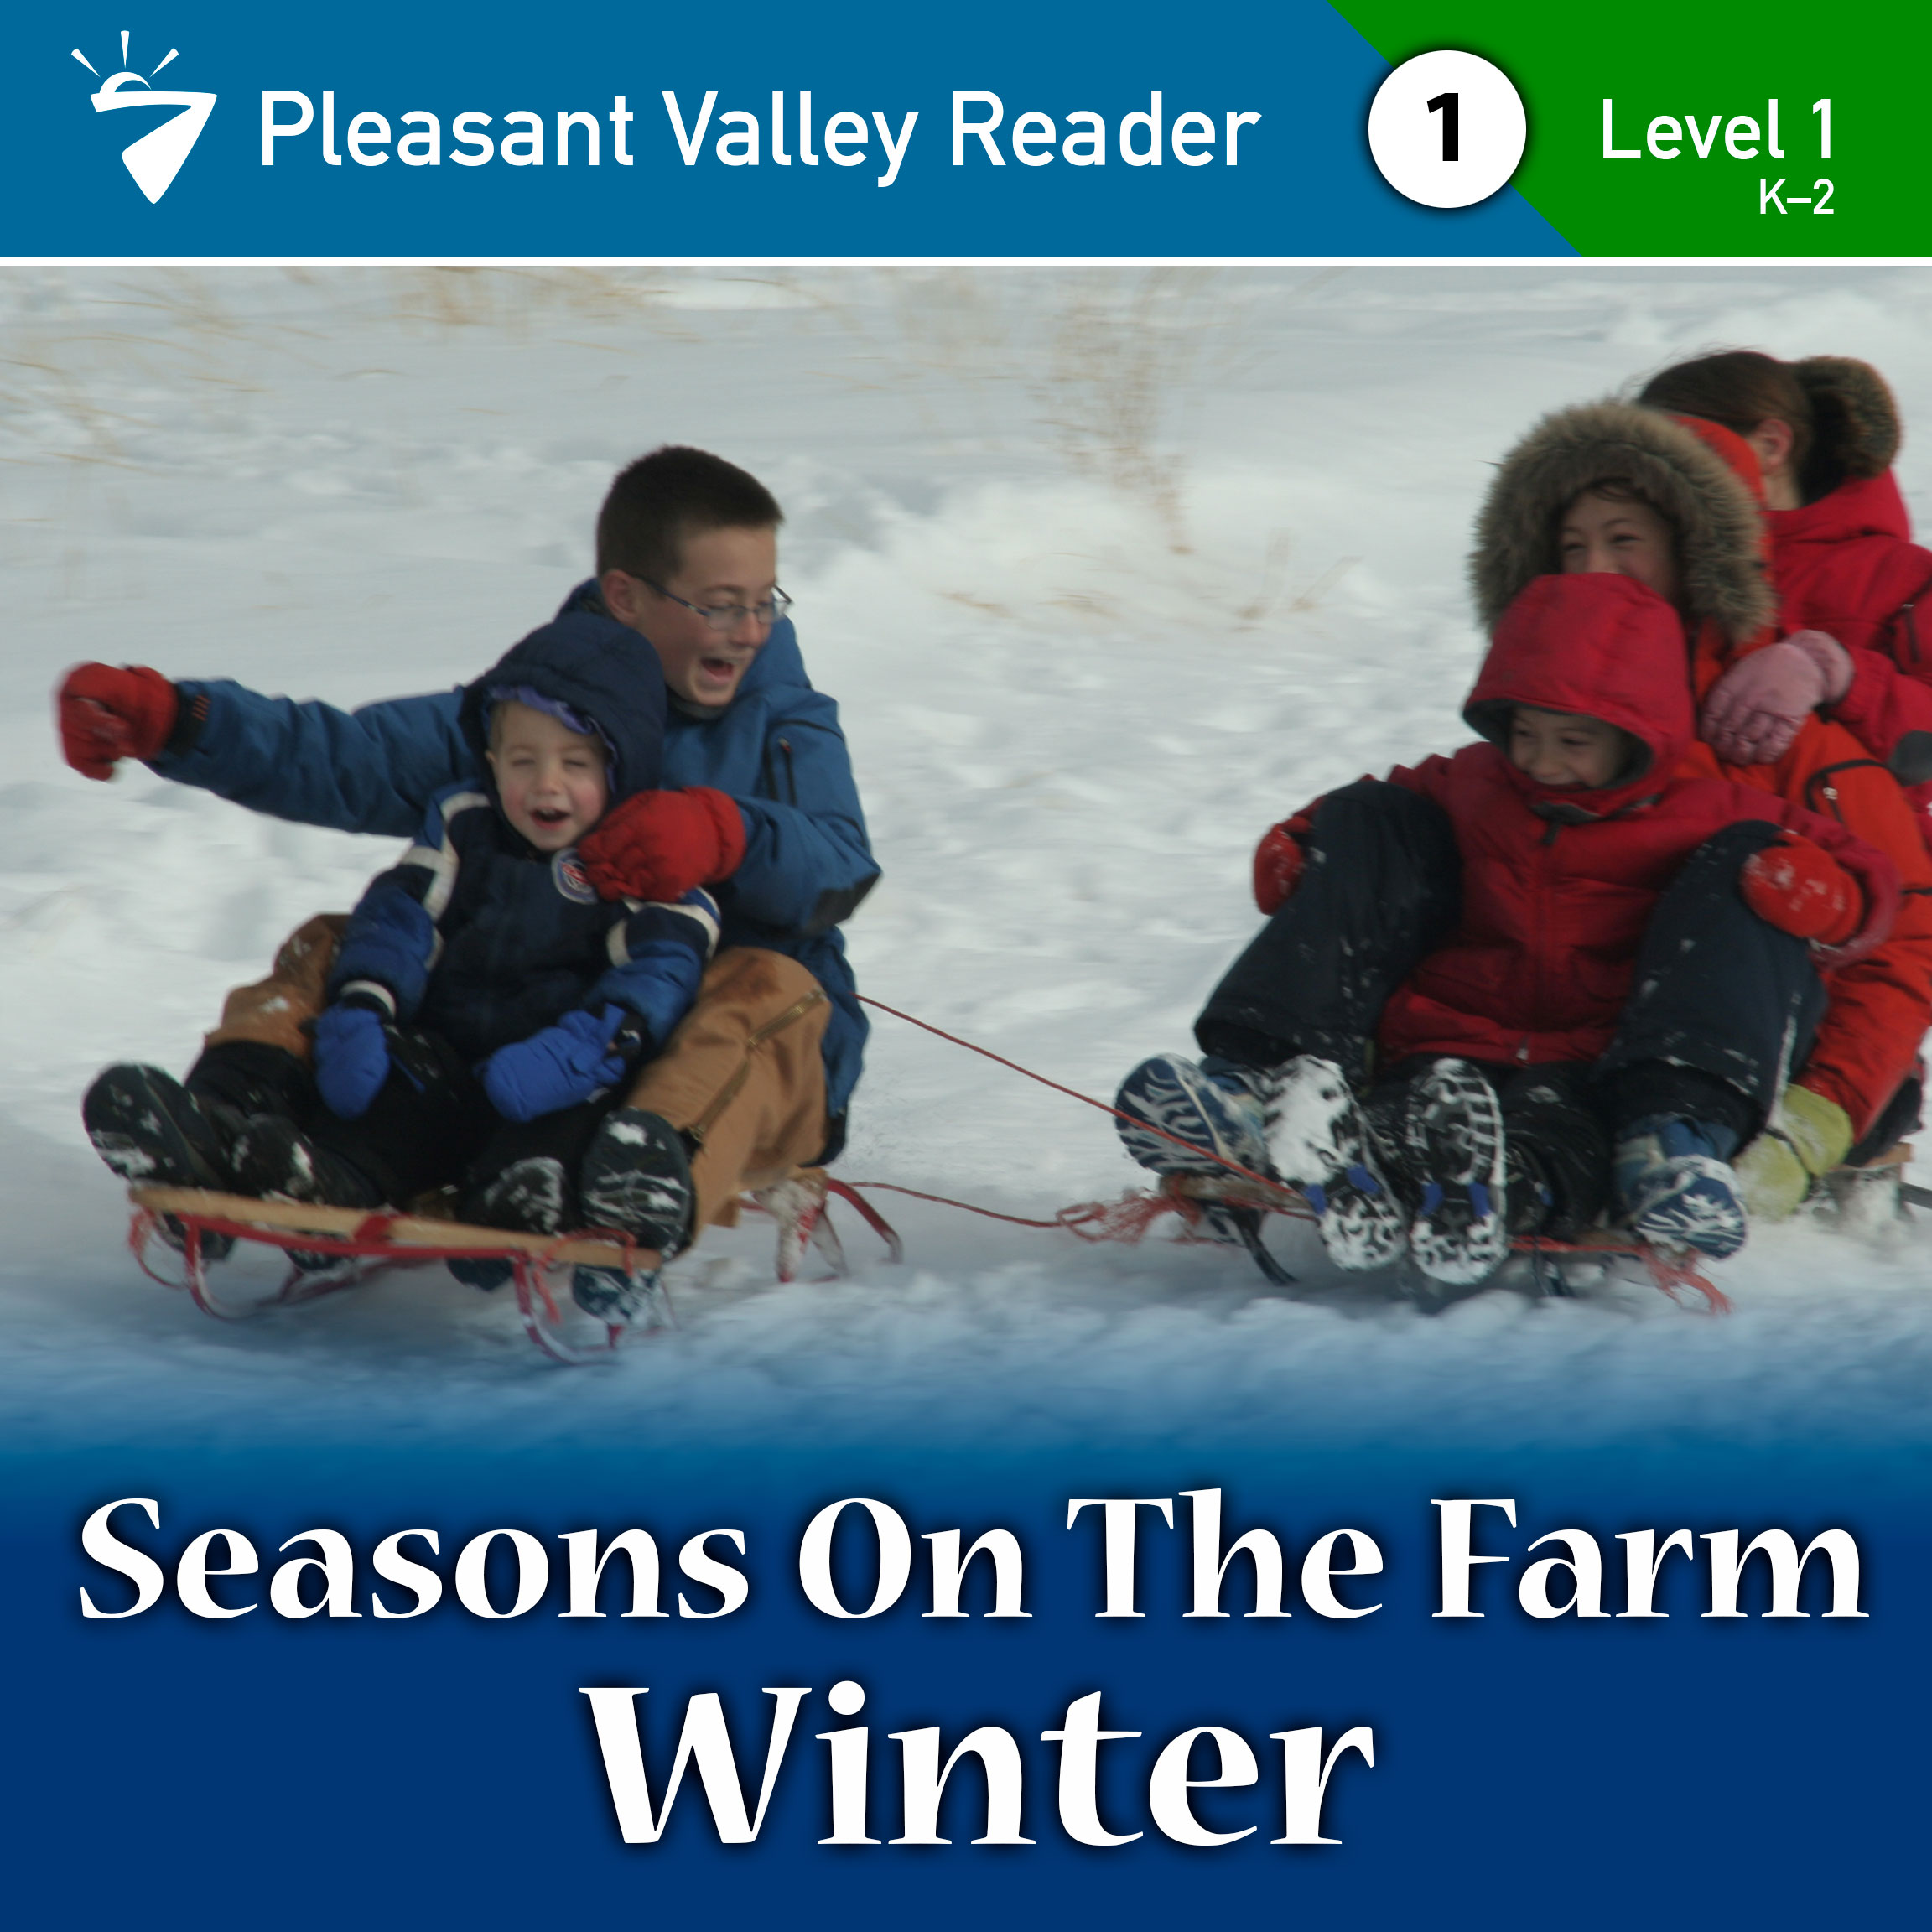 Seasons on the Farm: Winter